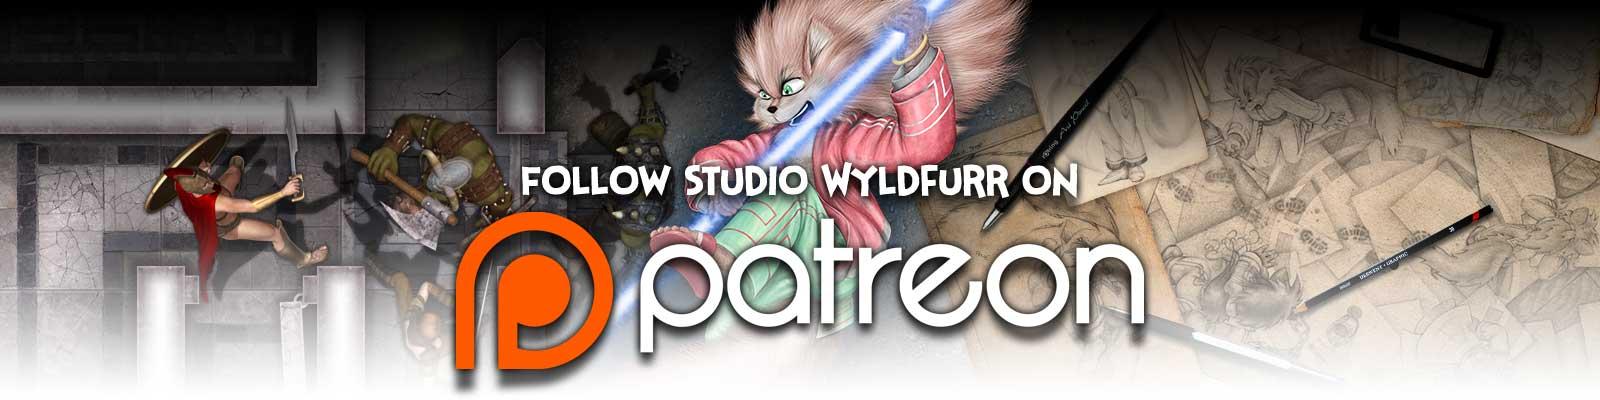 Follow Studio WyldFurr on Patreon